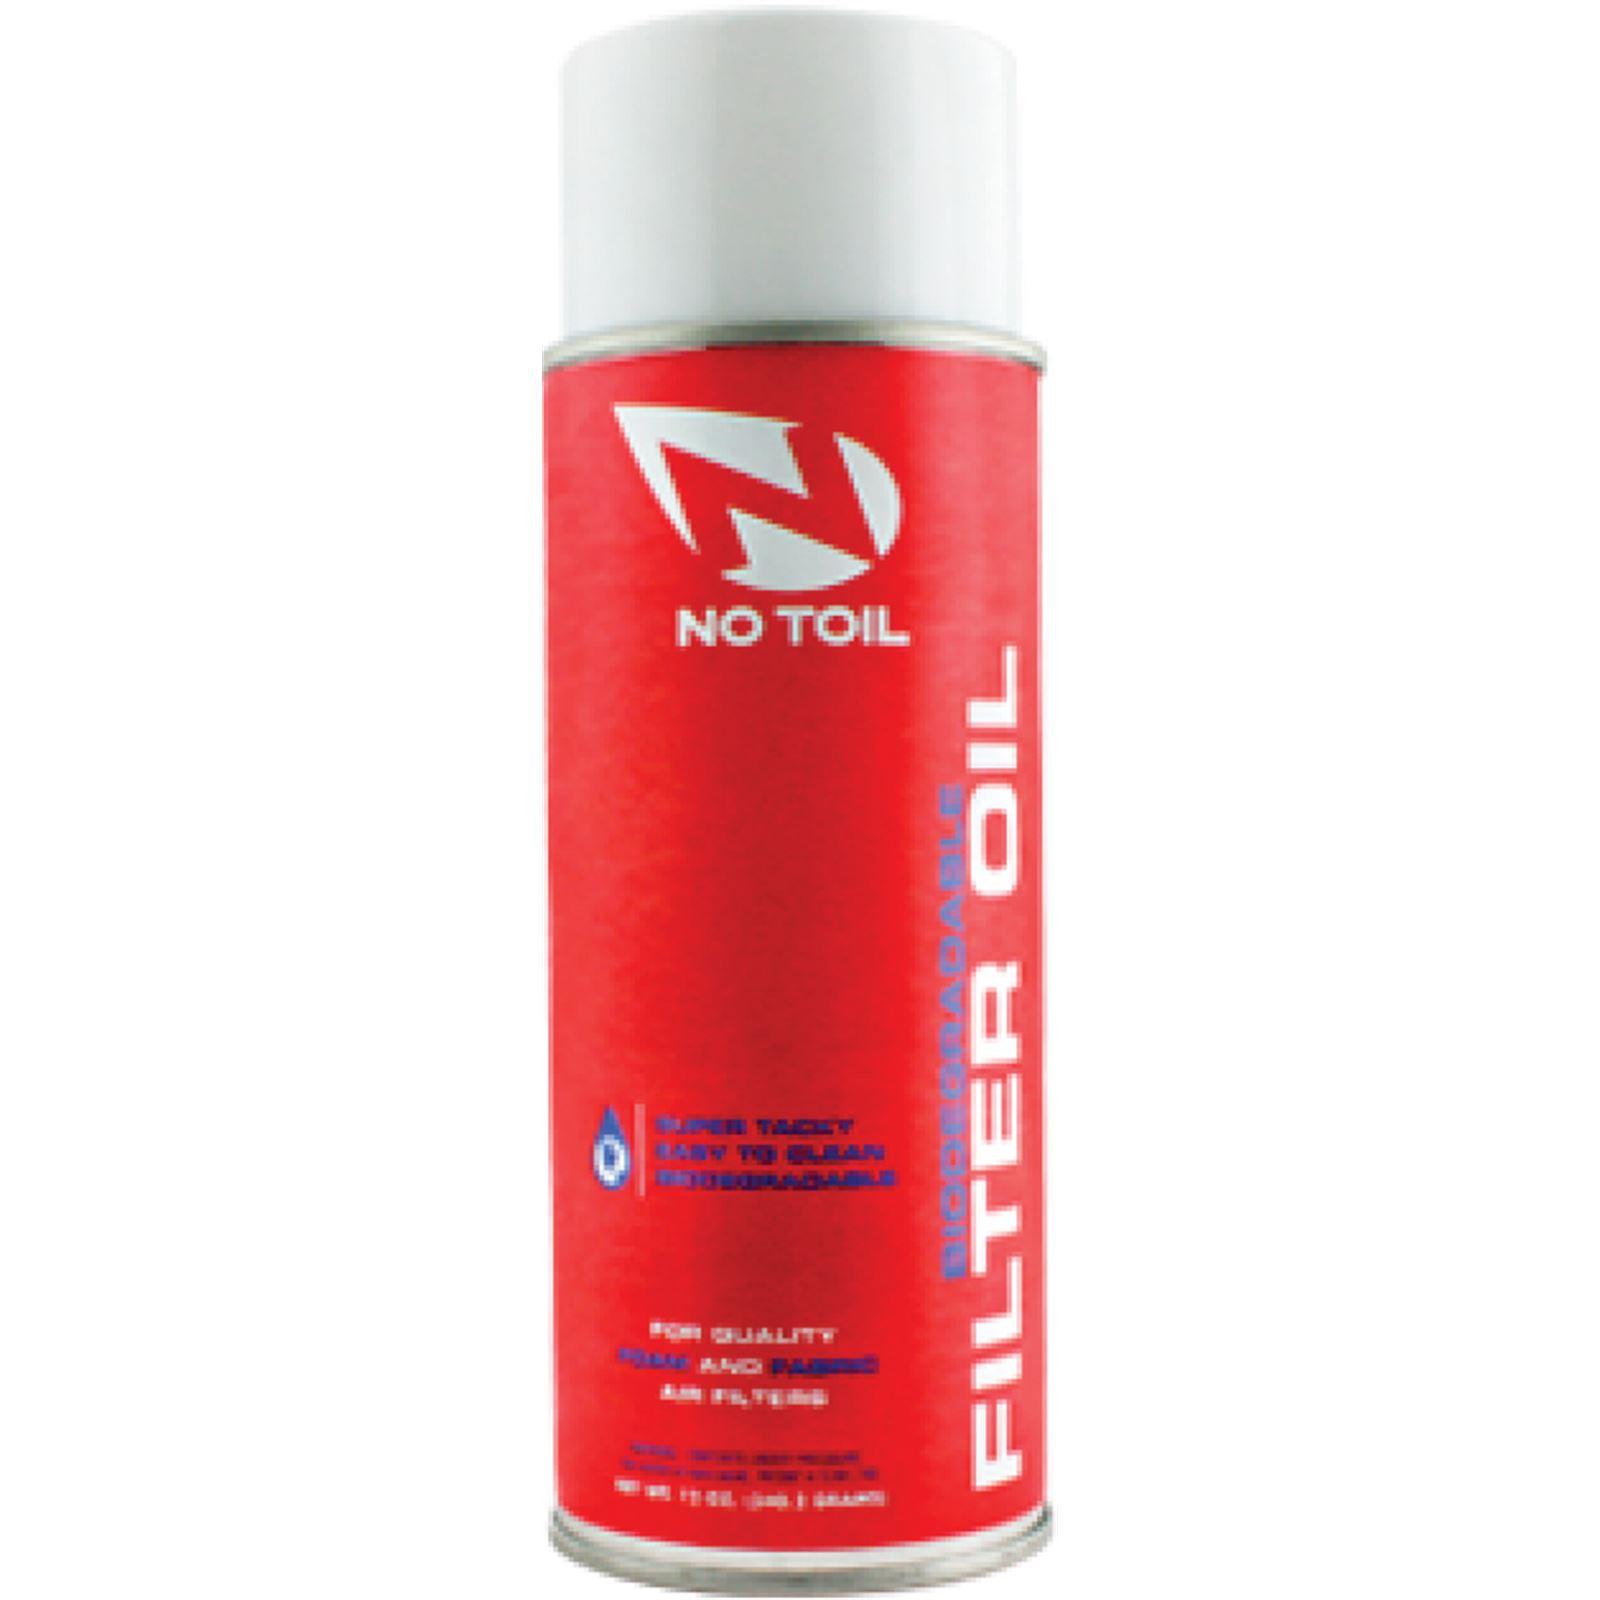 No Toil Air Filter Oil